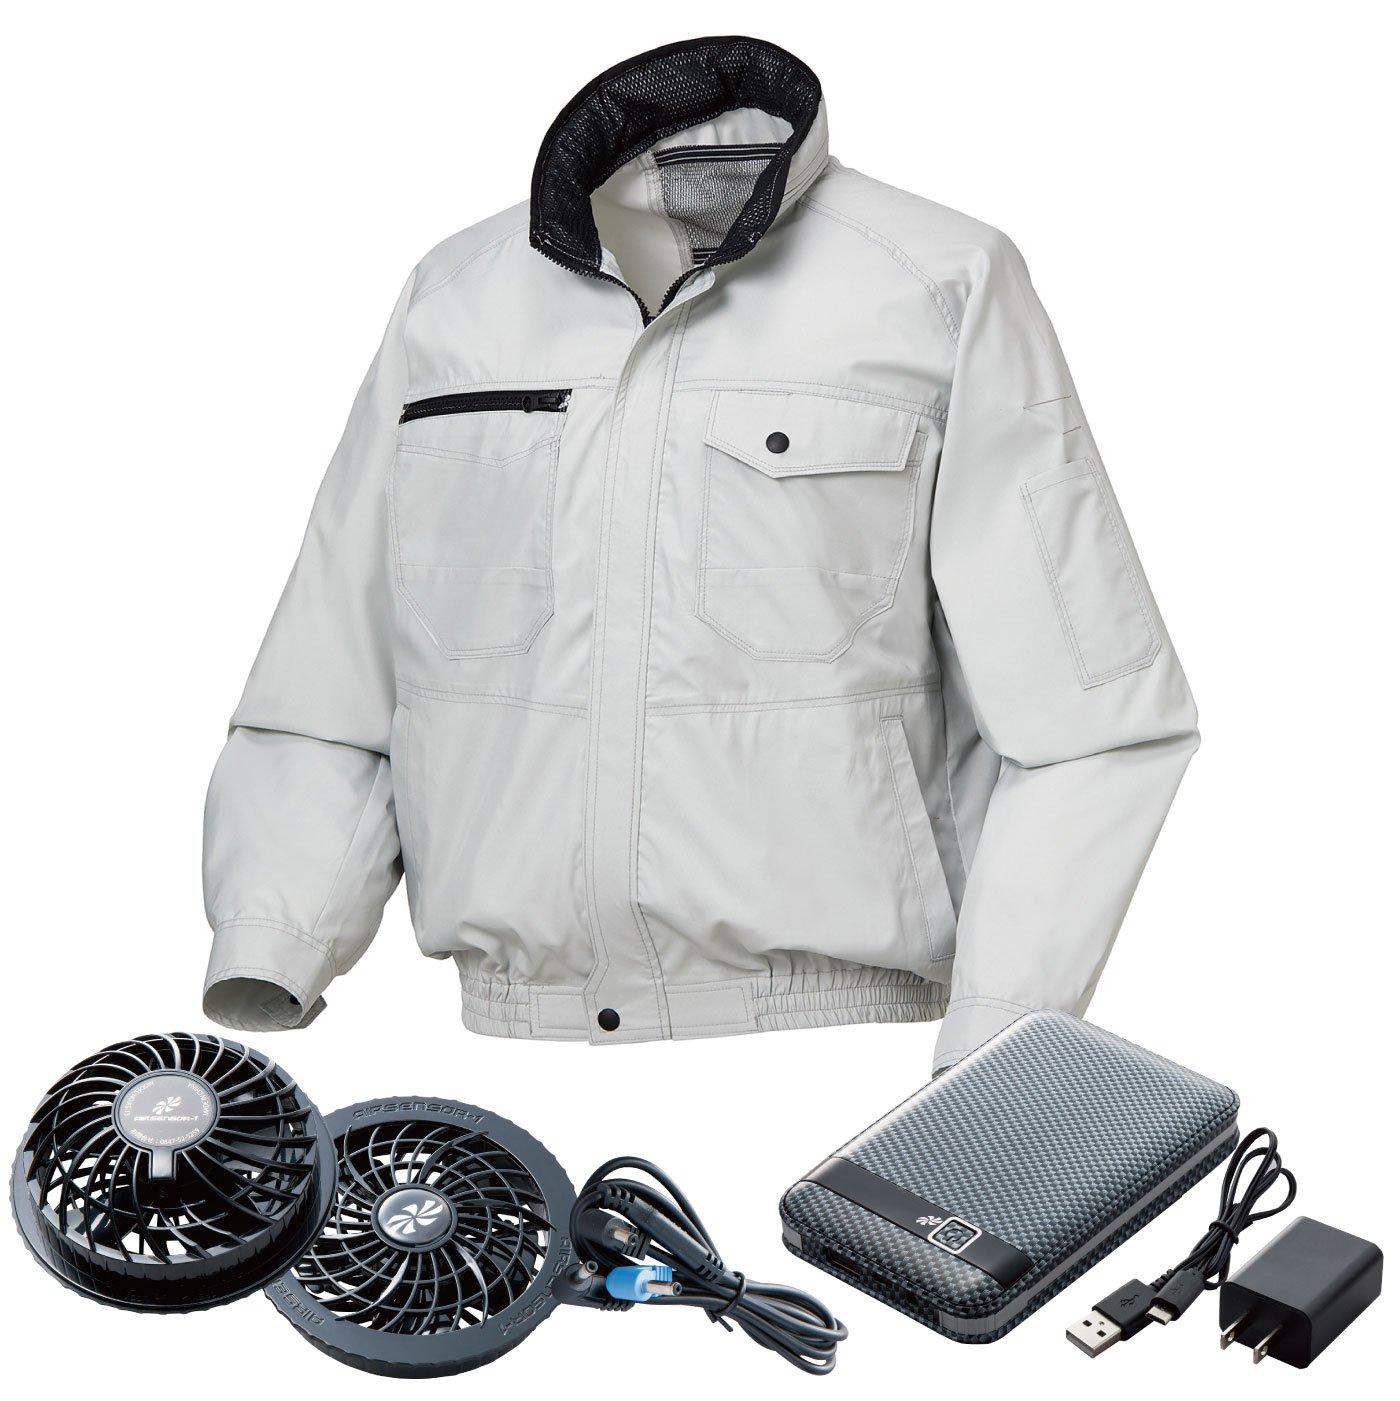 KURODARUMA(クロダルマ) 空調服 ファン付き フード付き長袖ジャンパー 空調服セット メンズ kd-258611-l 【空調服+ファンバッテリーセット】 B07CXH7LK7 4L|シルバー シルバー 4L